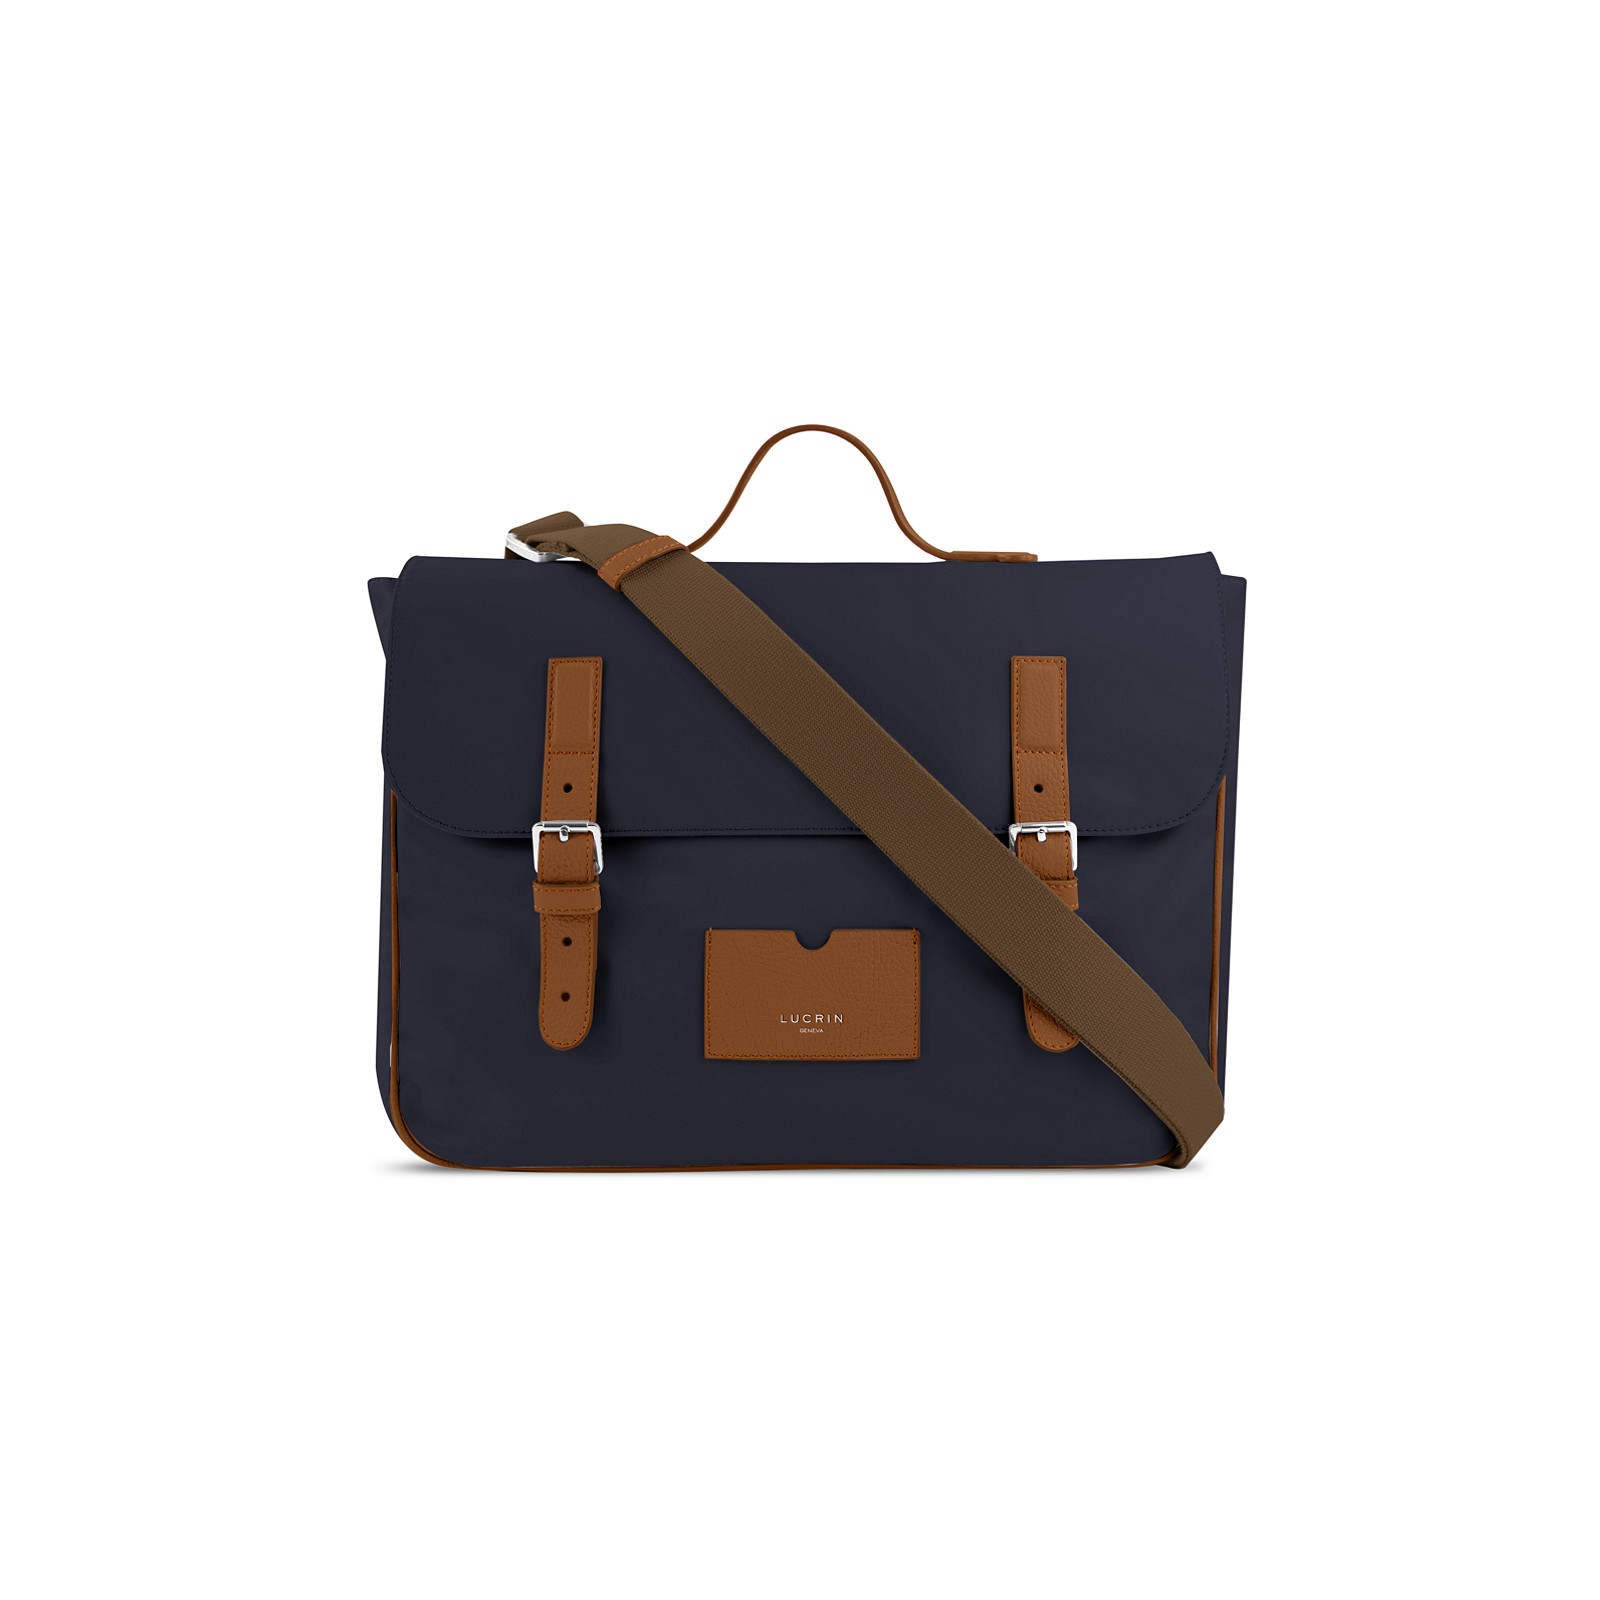 83d4d2095 Bolso de cartero en cuero y nailon Coñac-Azul marino - Canvas Bolso de  cartero en cuero y nailon Coñac-Azul marino - Canvas 